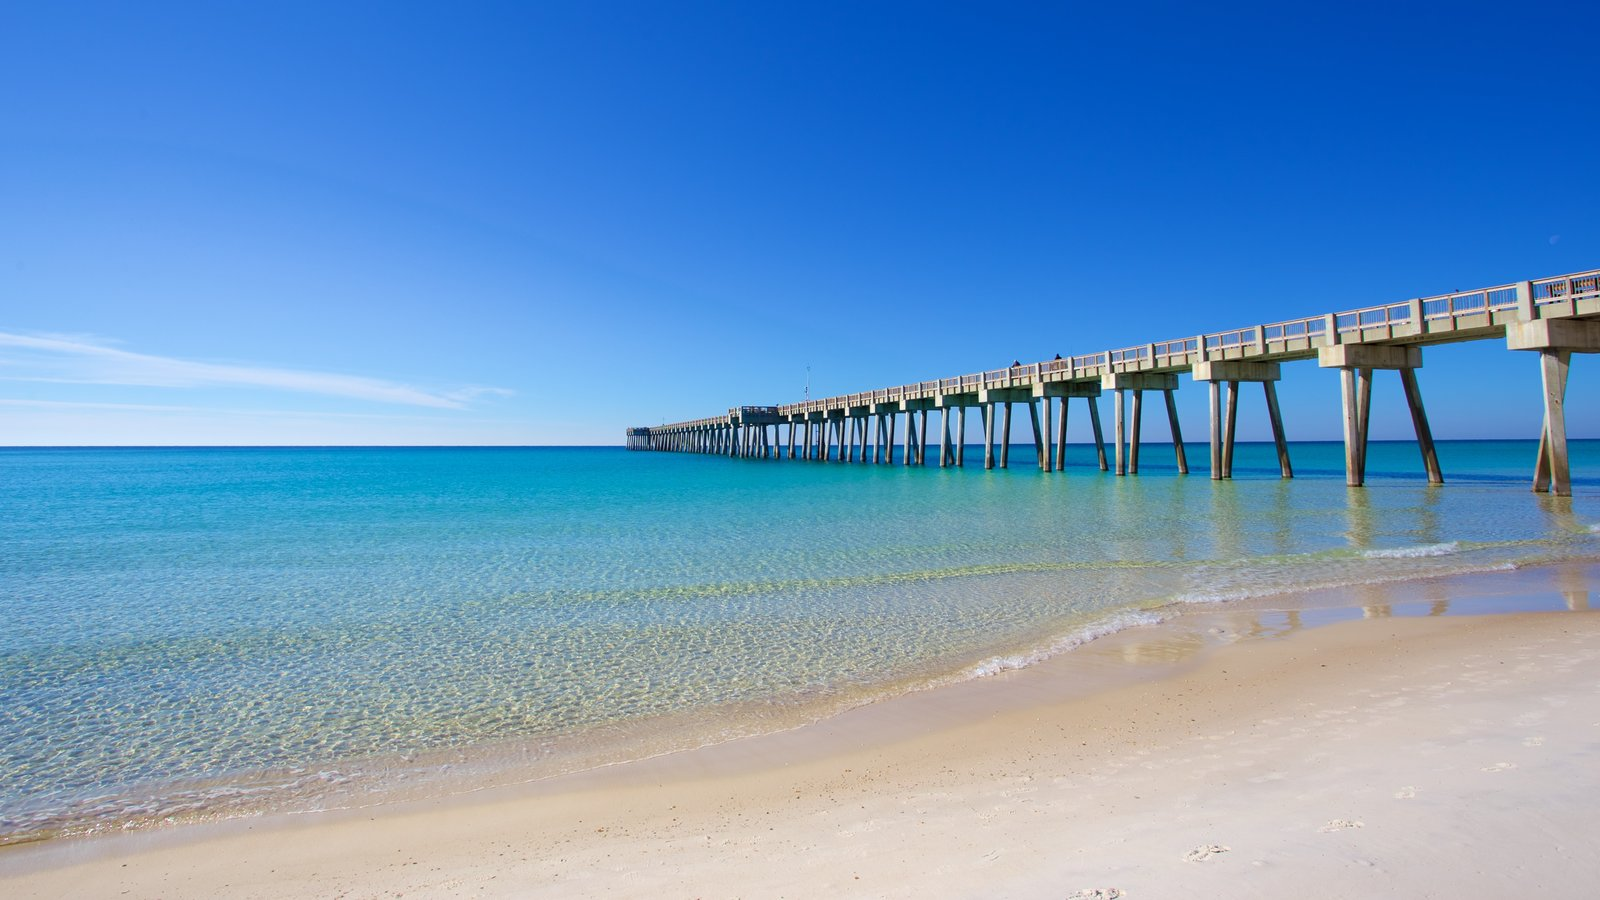 Pier Park showing a sandy beach